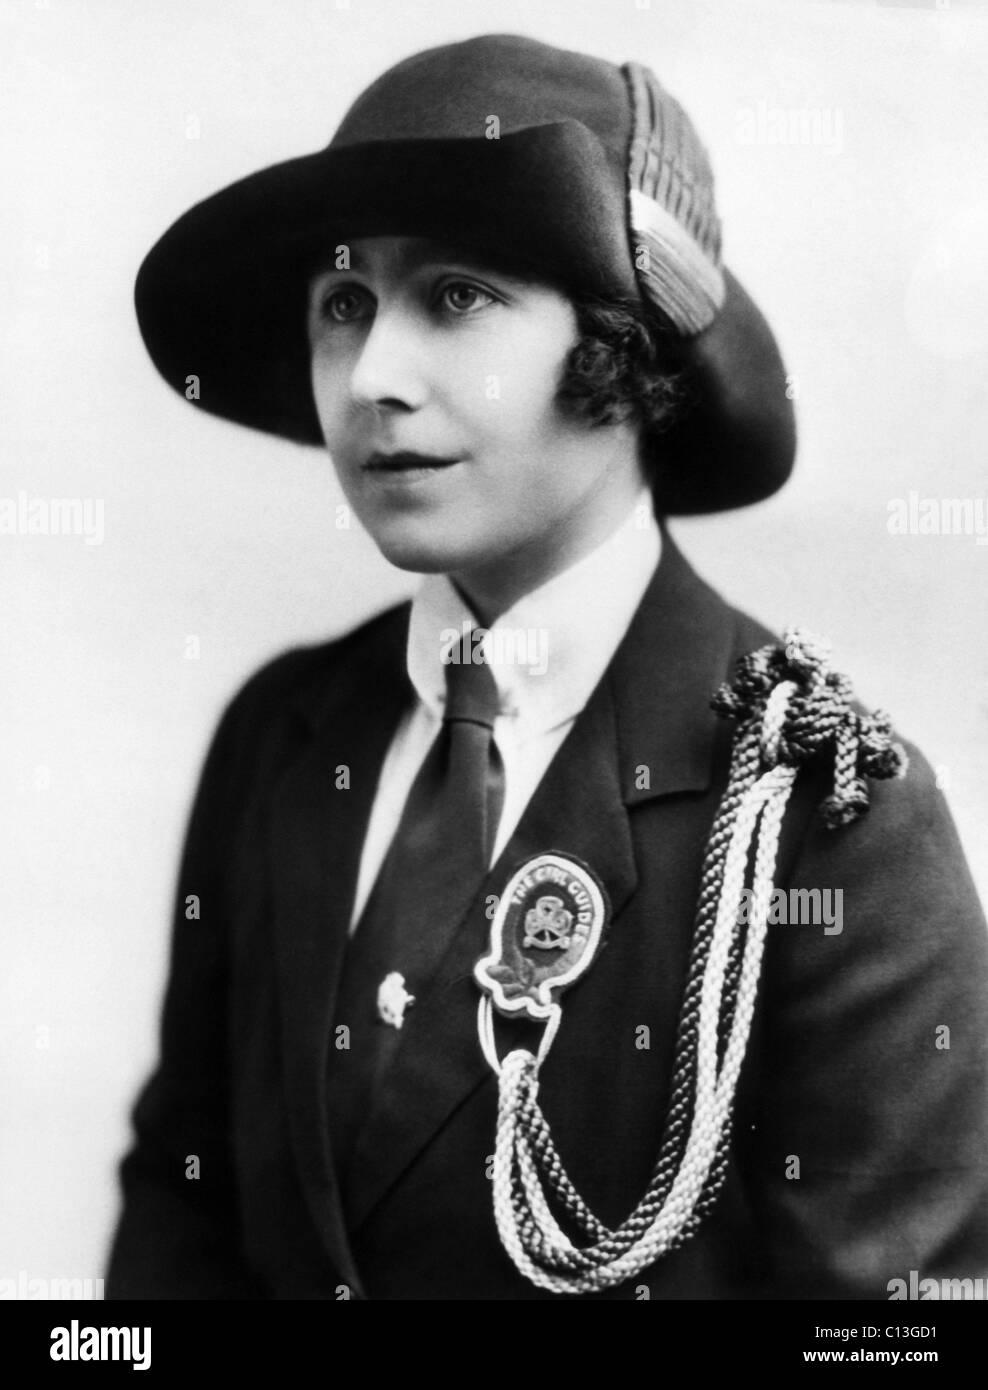 Elizabeth Bowes-Lyon (1900-2002), future Queen Elizabeth, in her Girl Guides uniform, circa 1910s. - Stock Image